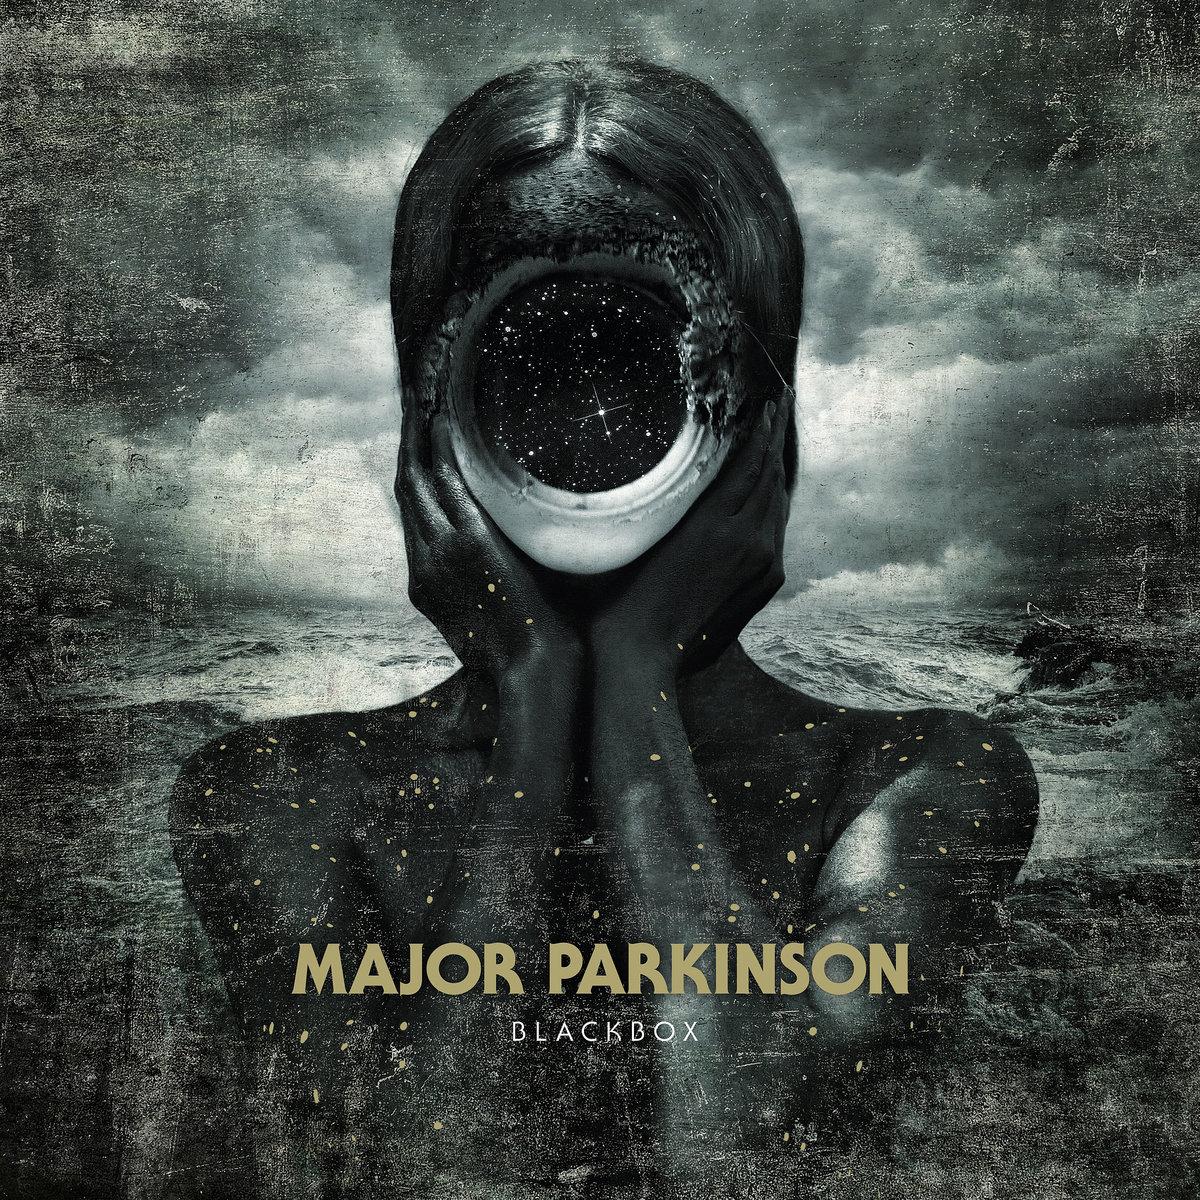 Major Parkinson: Blackbox